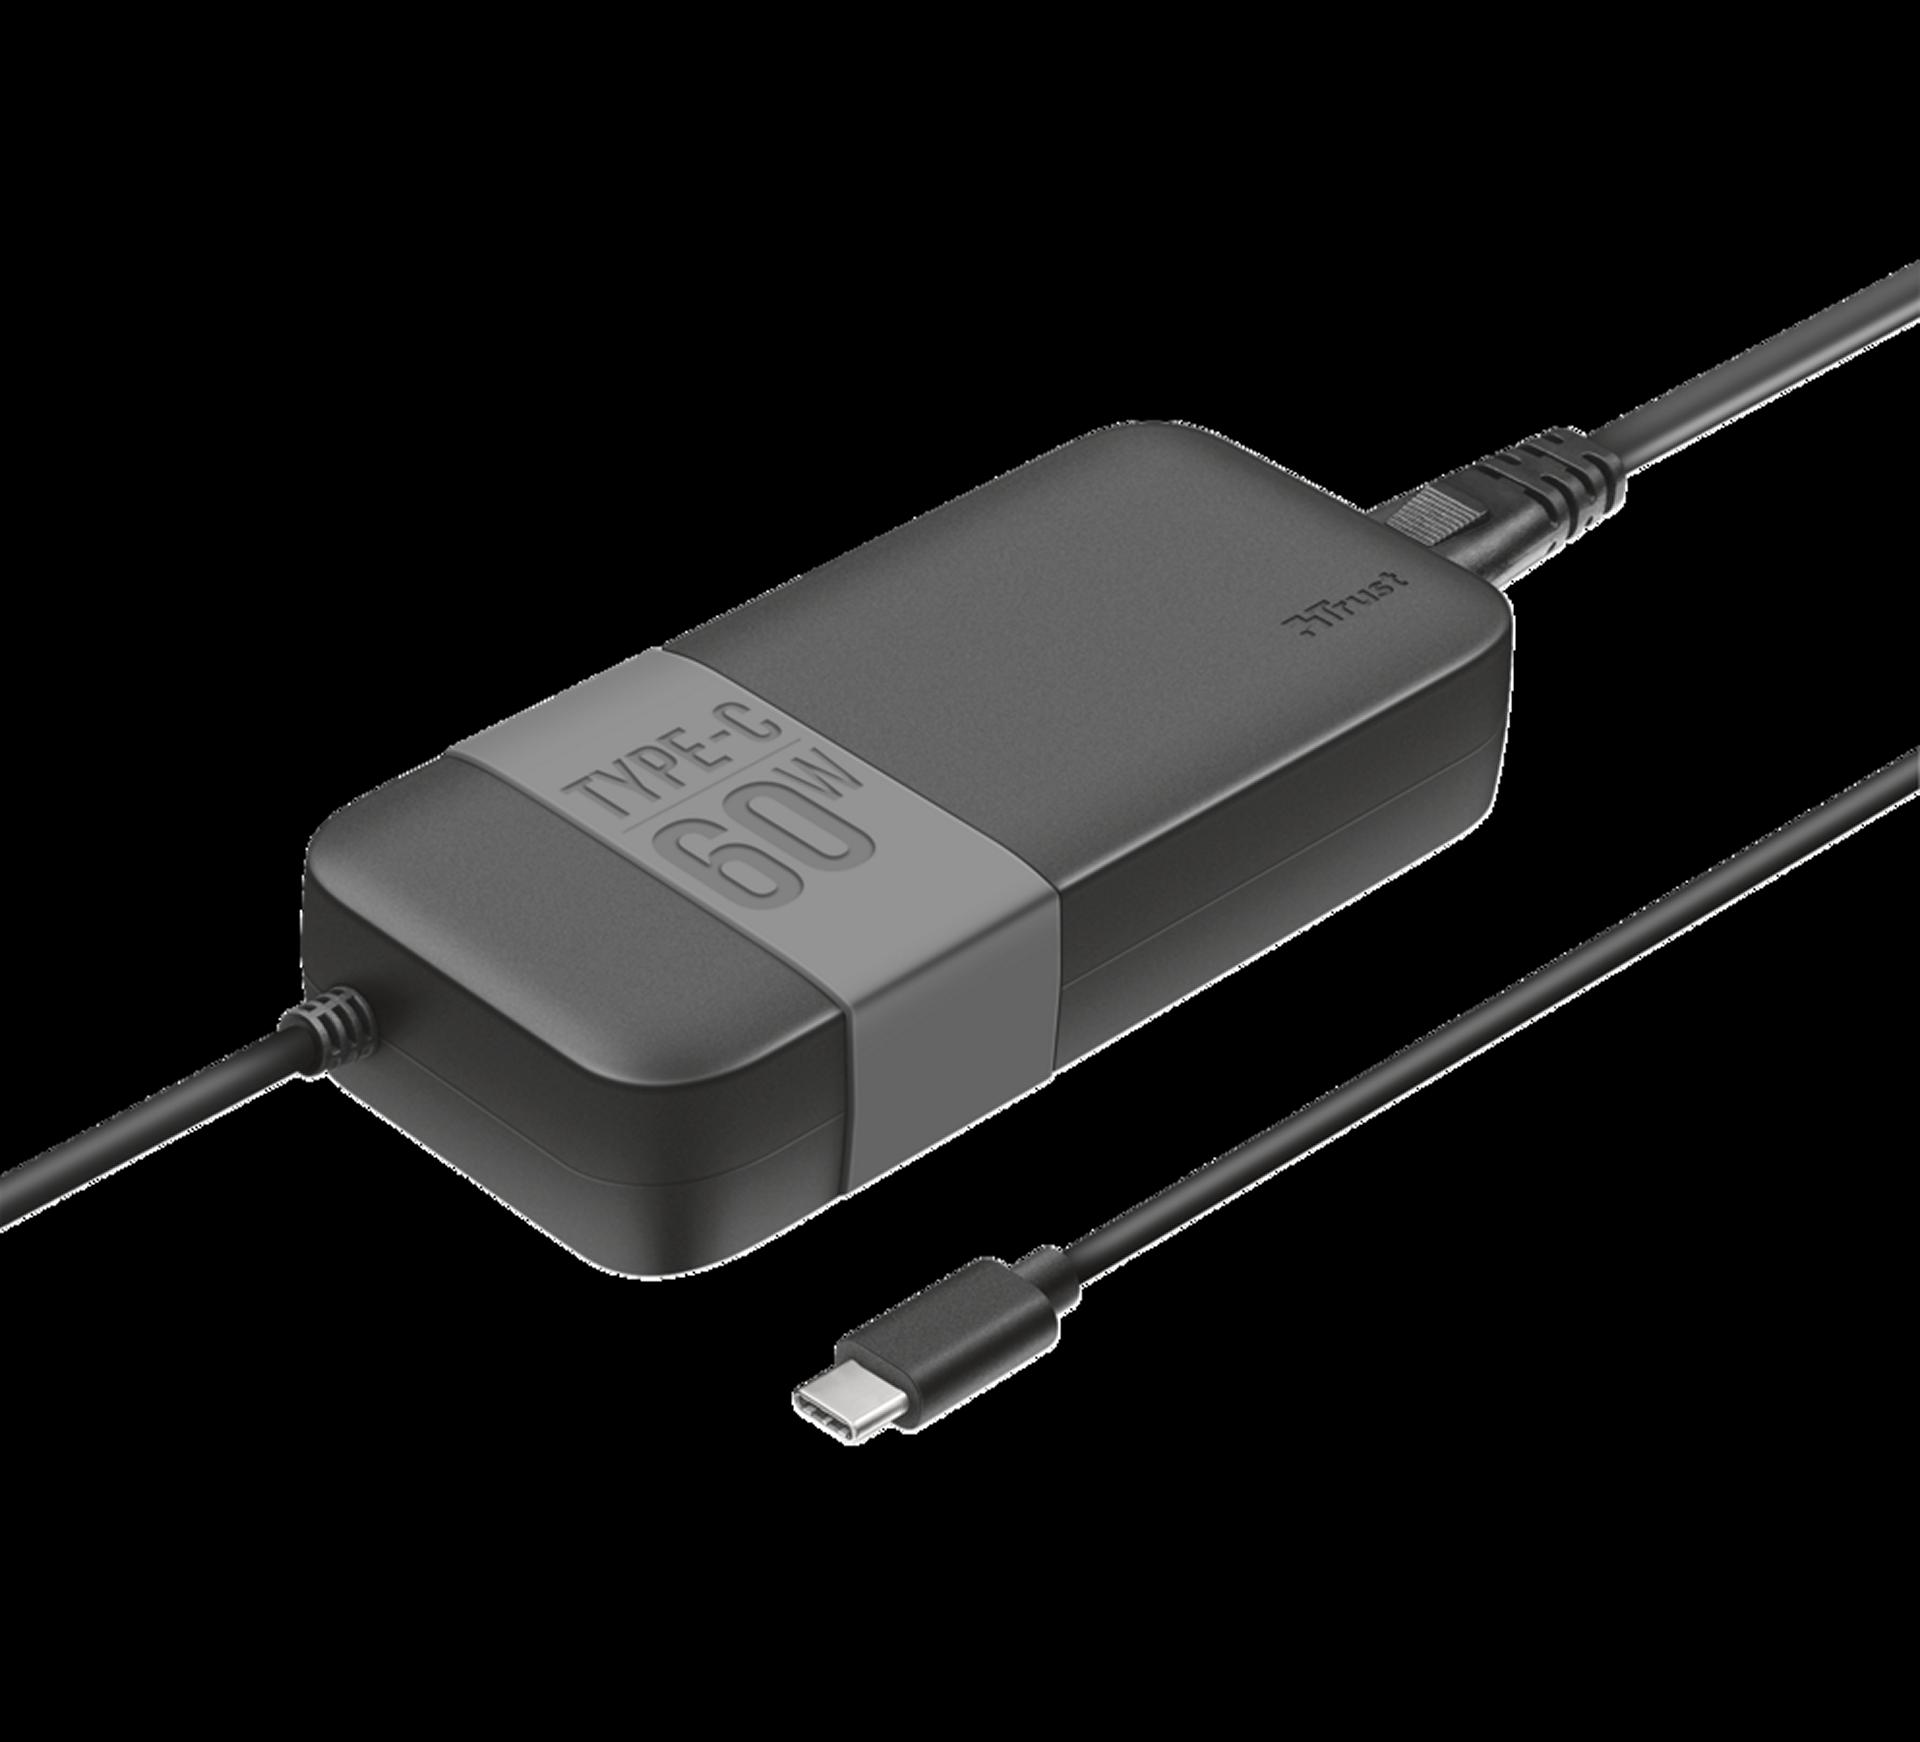 nabíječka TRUST Moda Universal 60W USB-C Charger